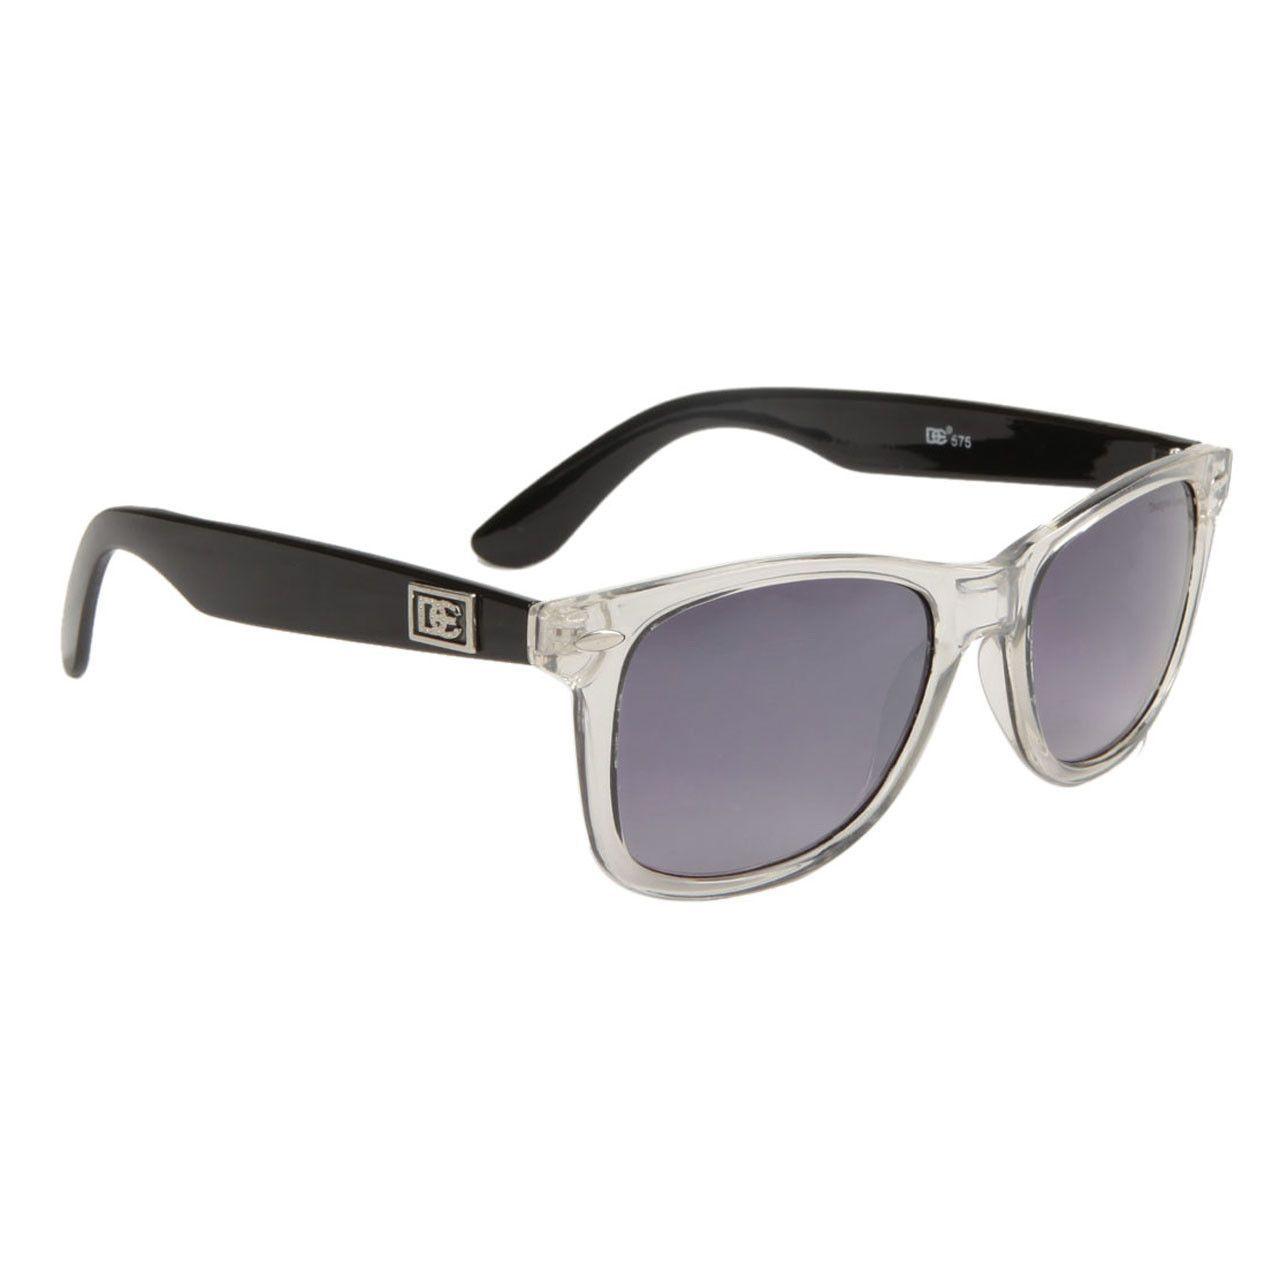 904501ca1cf Designer Eyewear Women s Wayfarer Sunglasses DE575